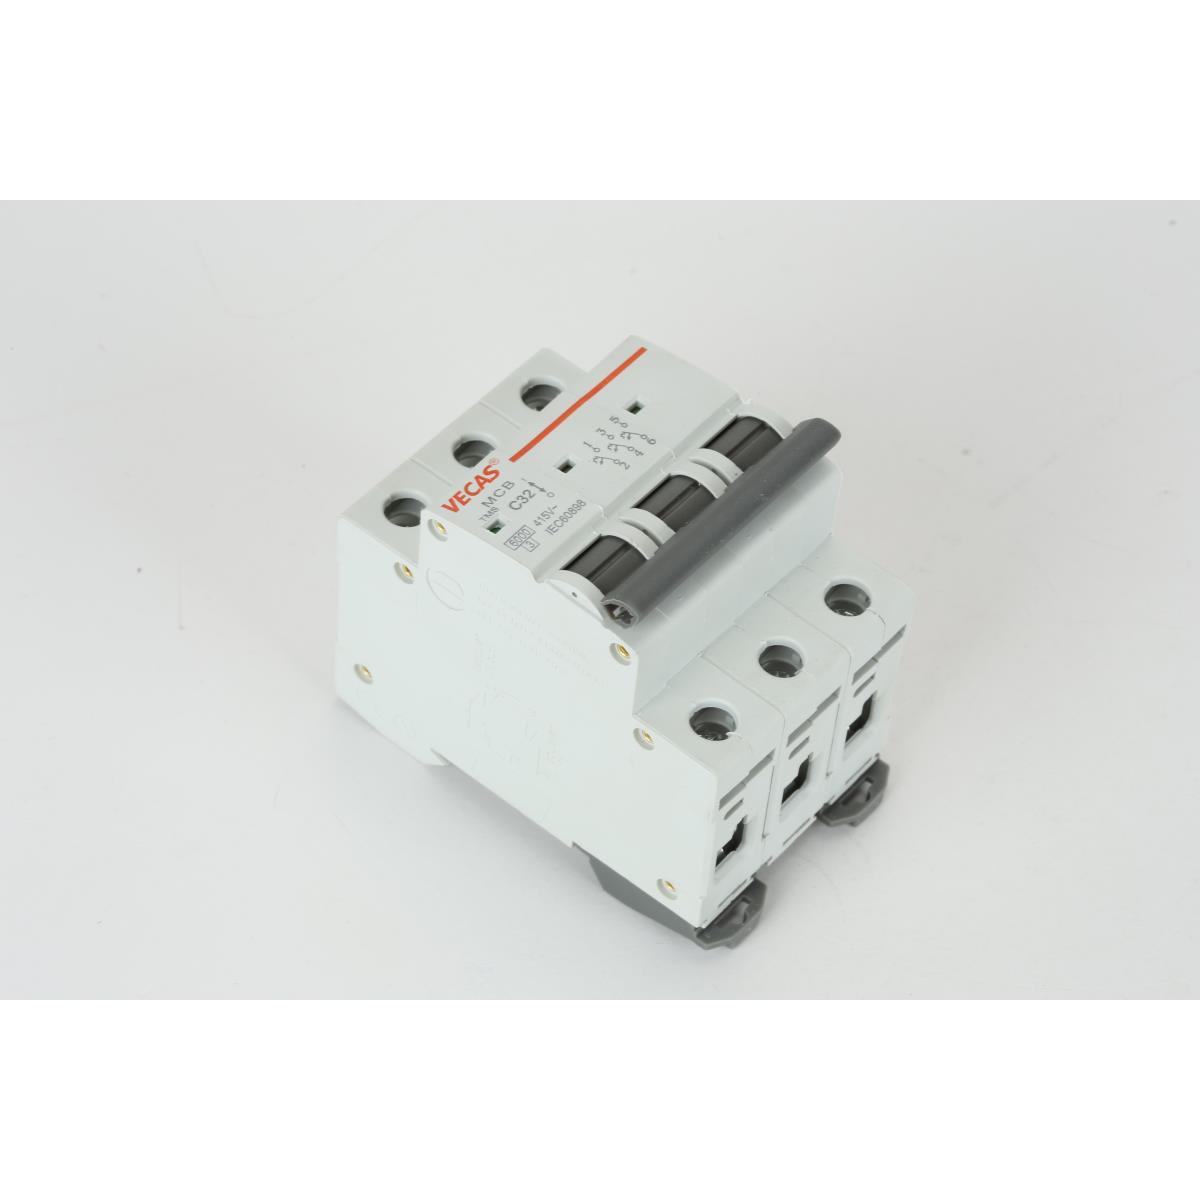 Großartig Verdrahtung 3 Poliger Schalter Fotos - Schaltplan Serie ...